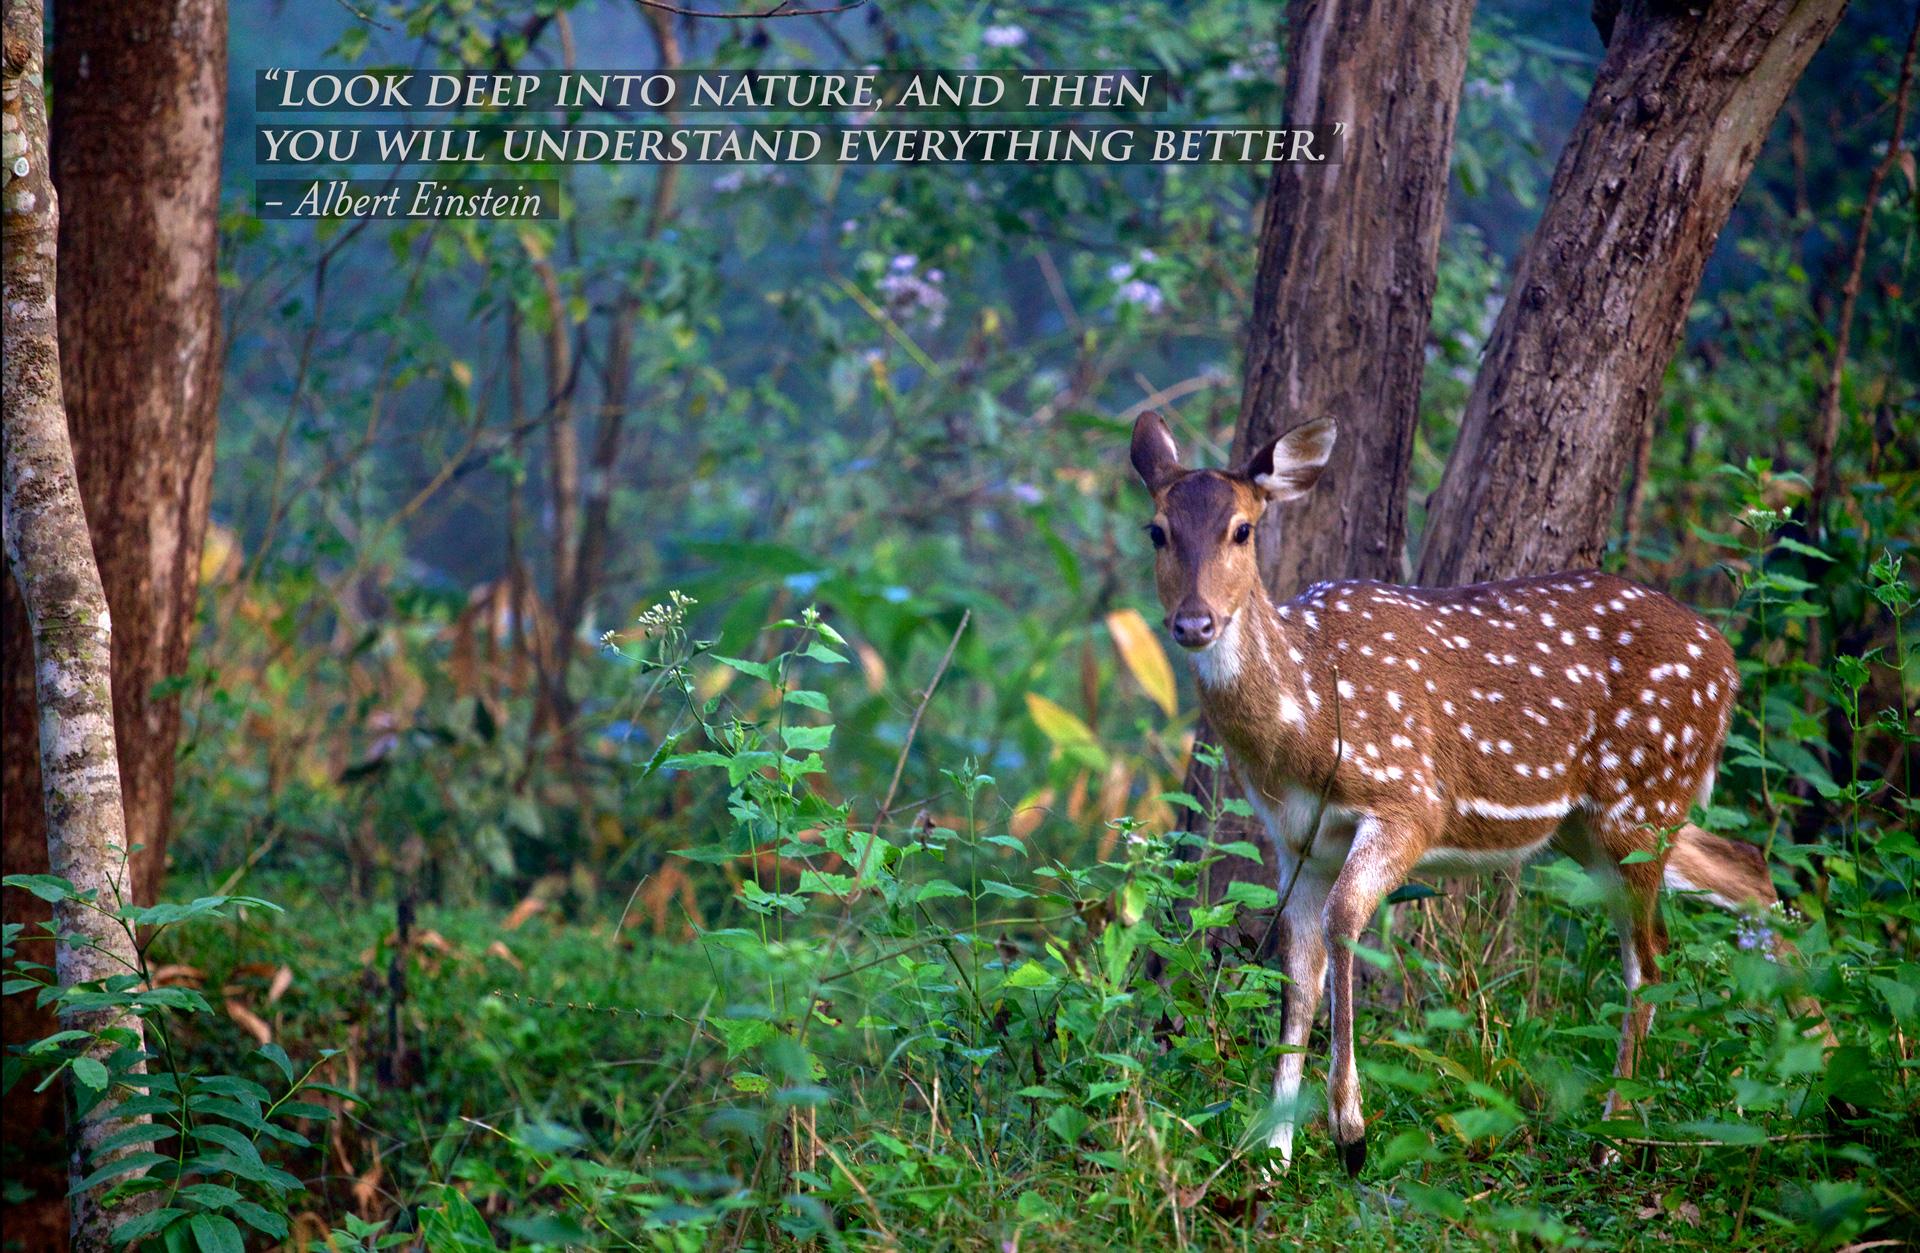 029_35---India-04.jpg